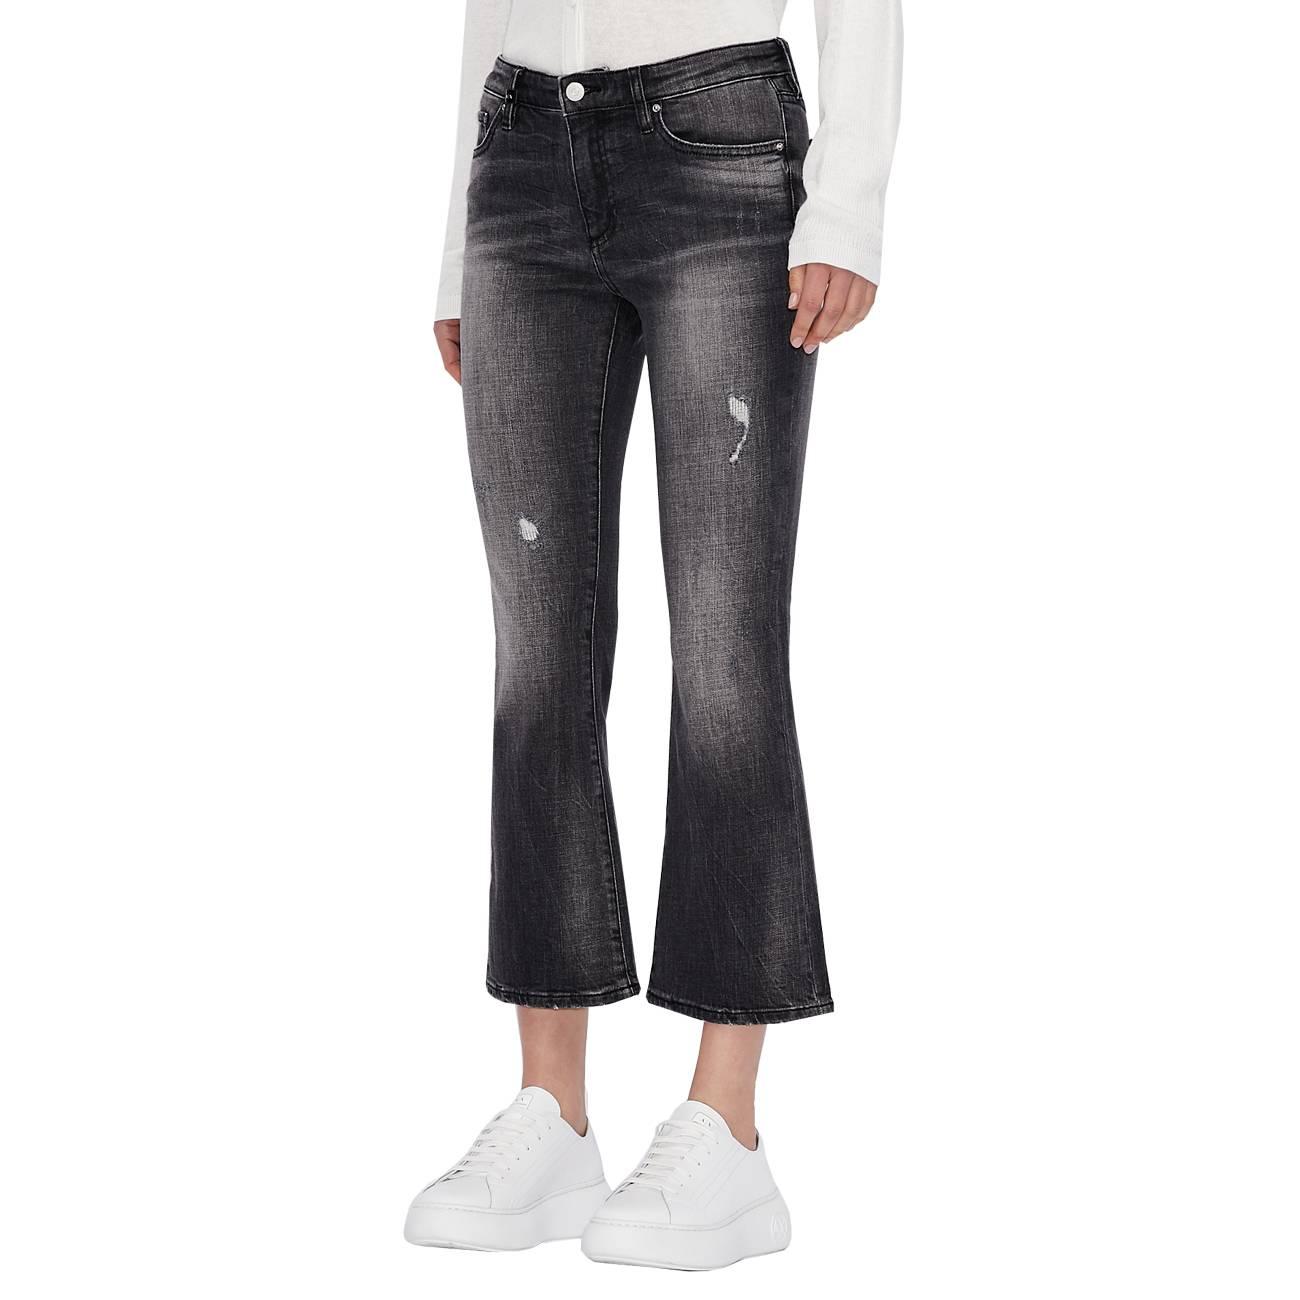 Jeans Grey Denim 29s